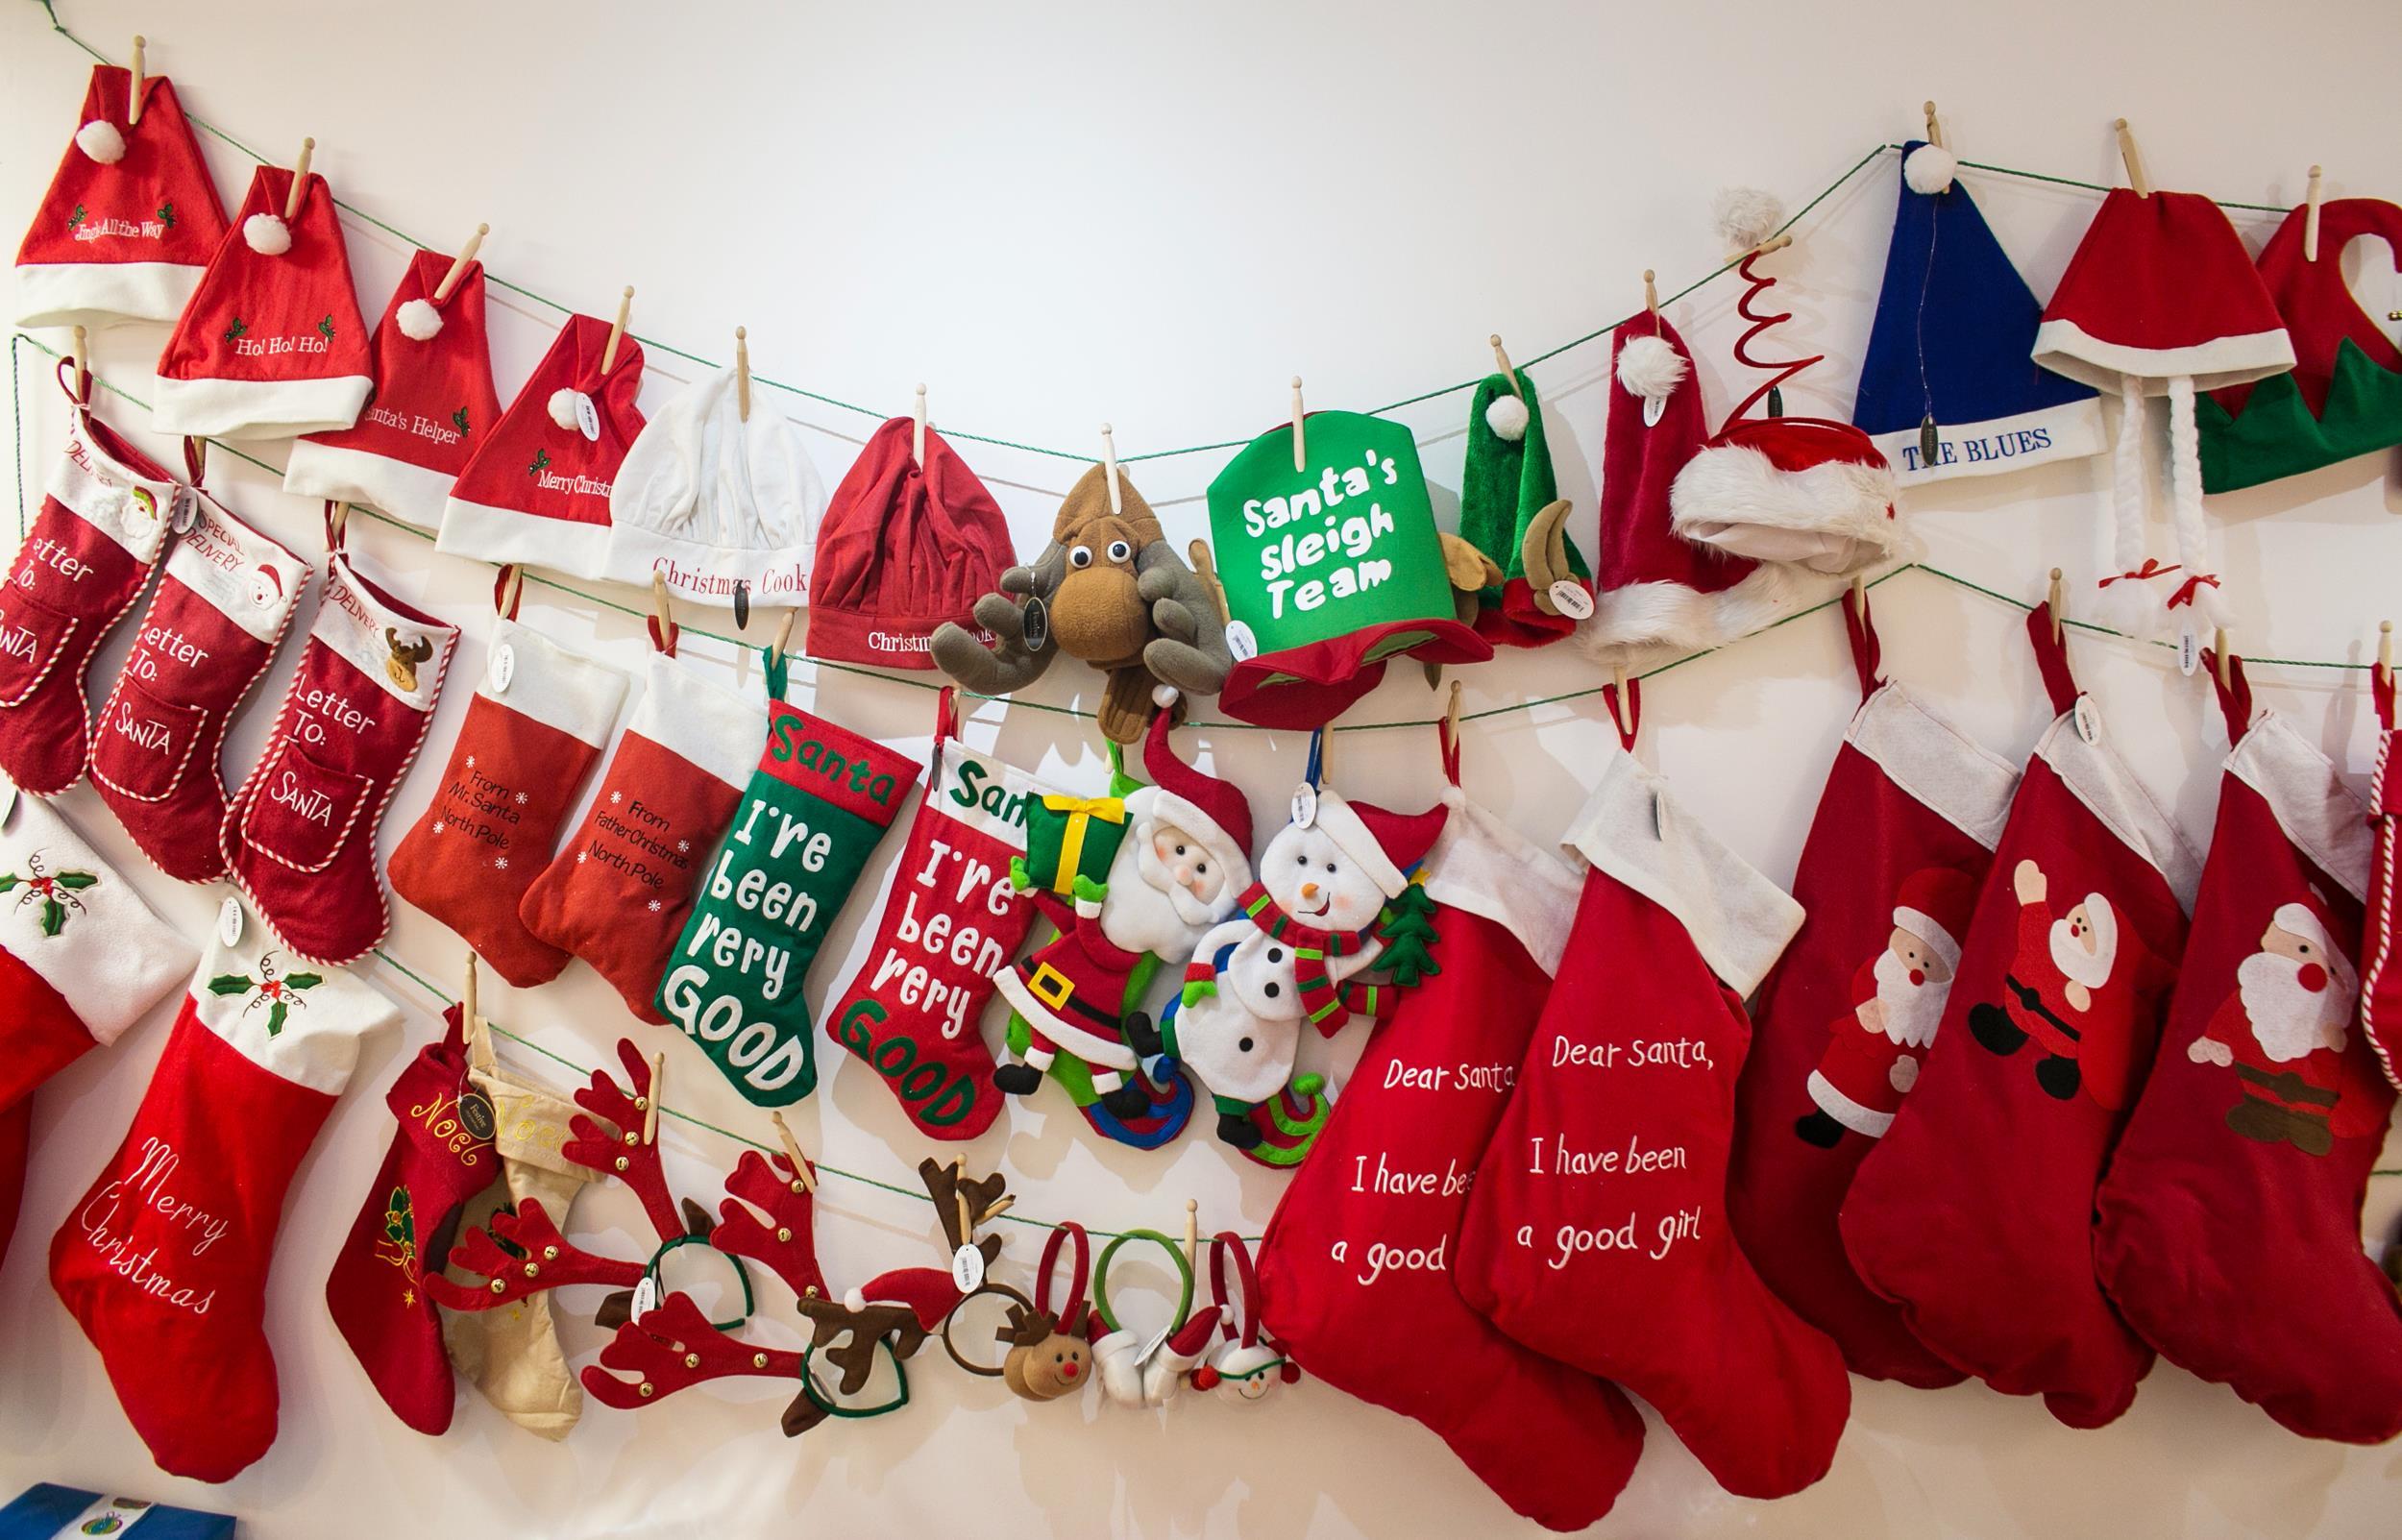 Mens Stocking Stuffers 2016 It S Not Too Late Last Minute Stocking Stuffers 15